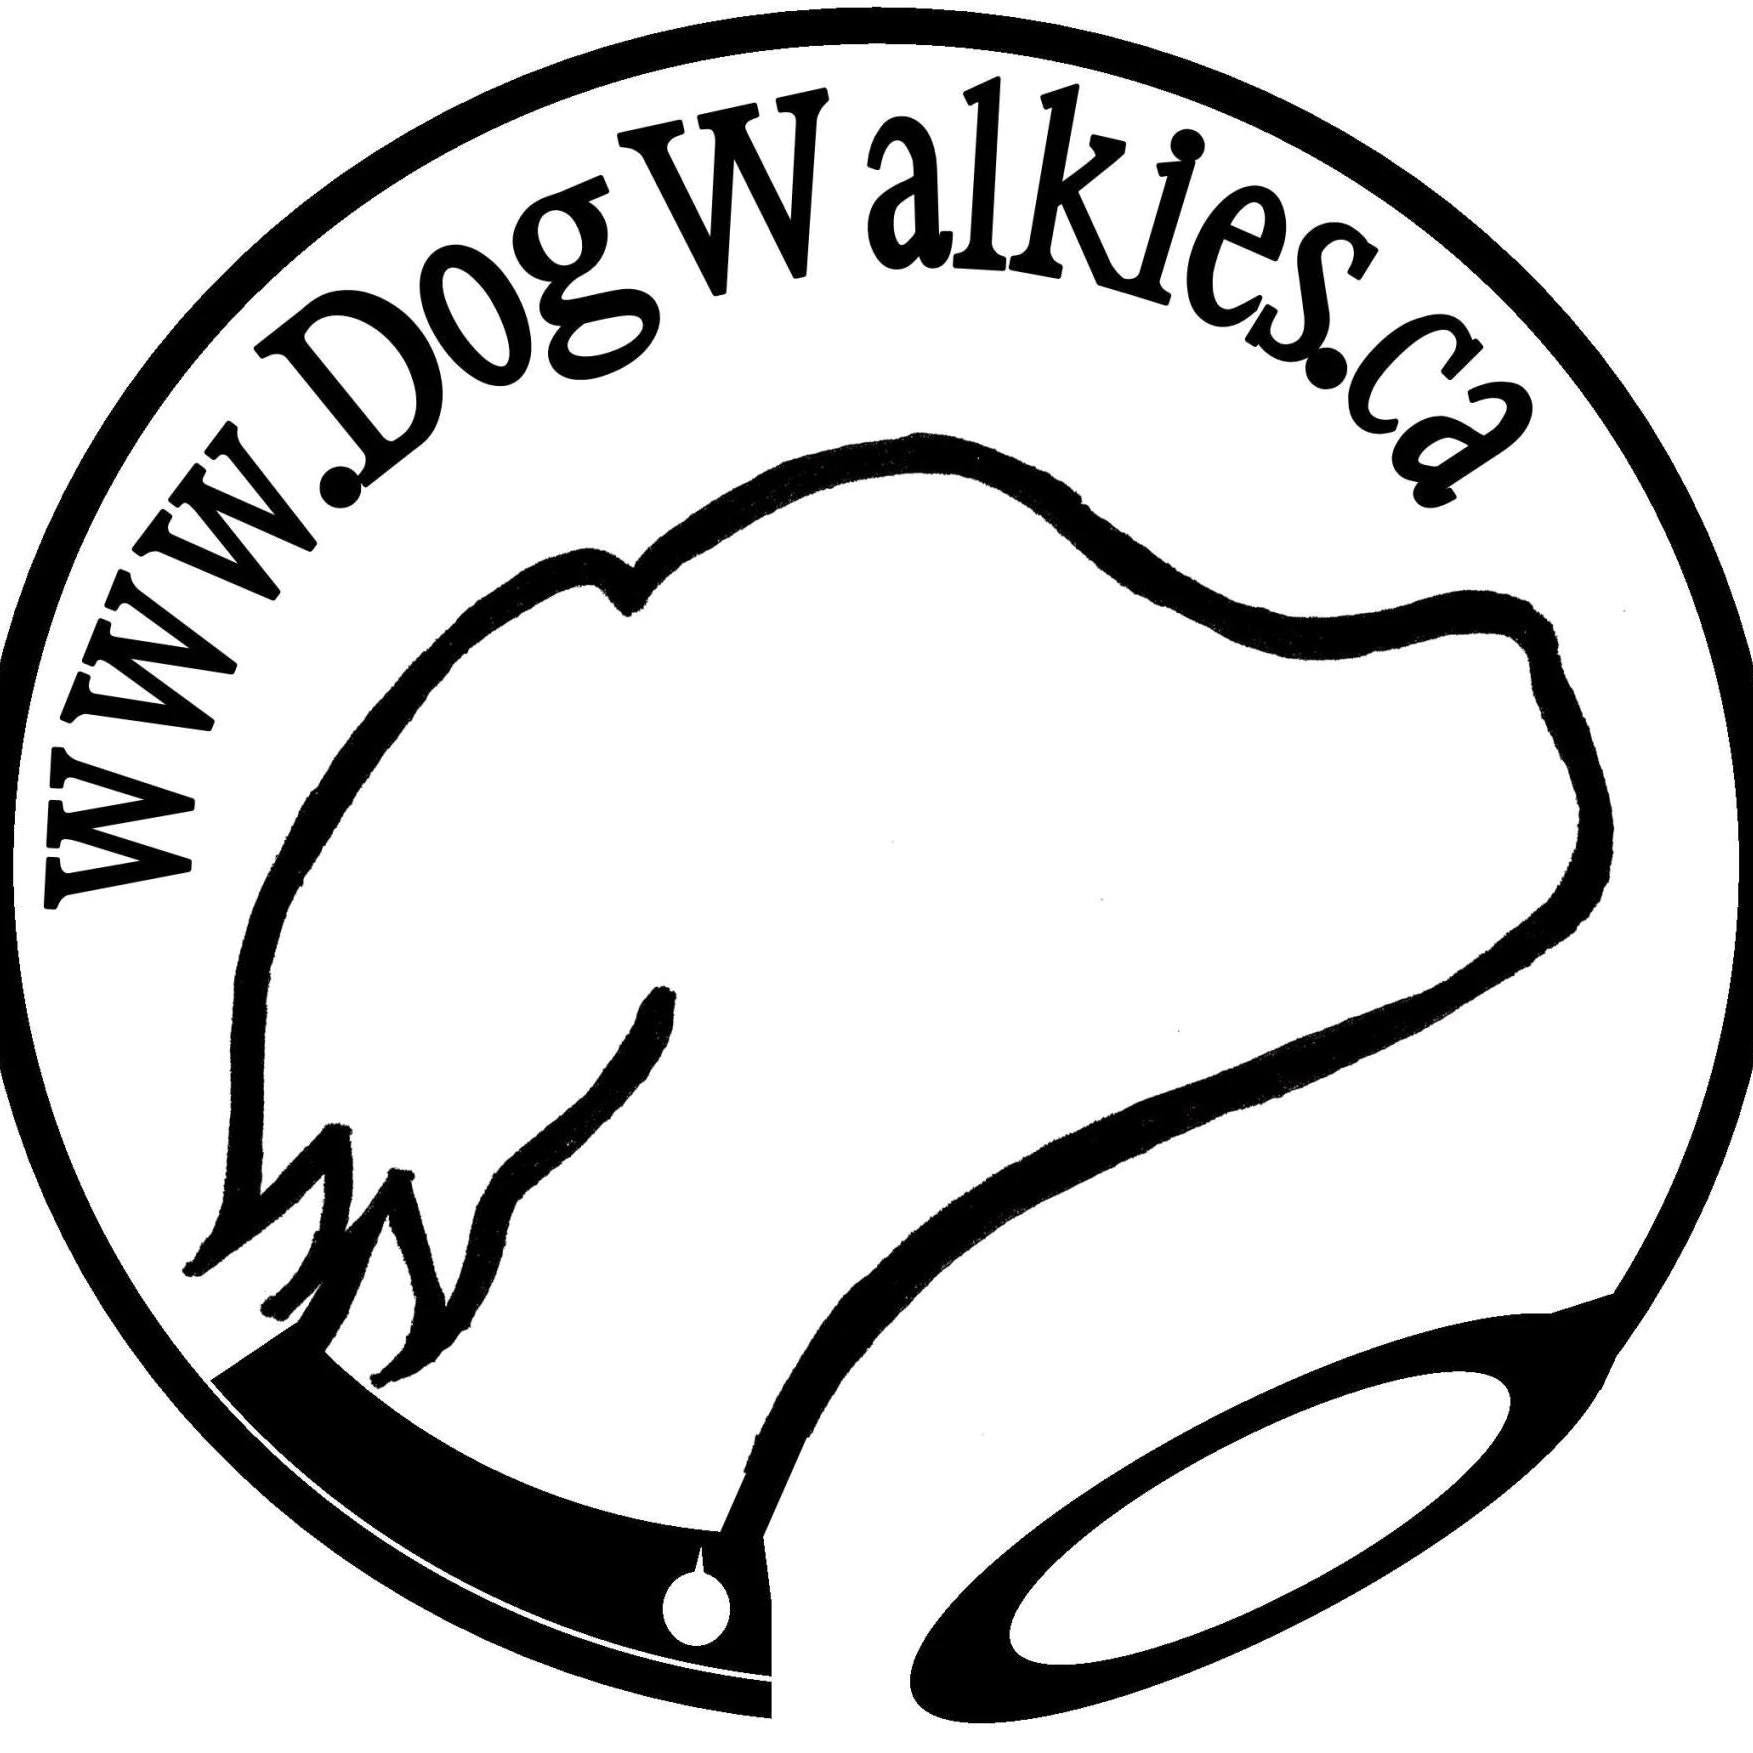 Custom Handmade Dog Collars Amp Leashes By Dogwalkies On Etsy